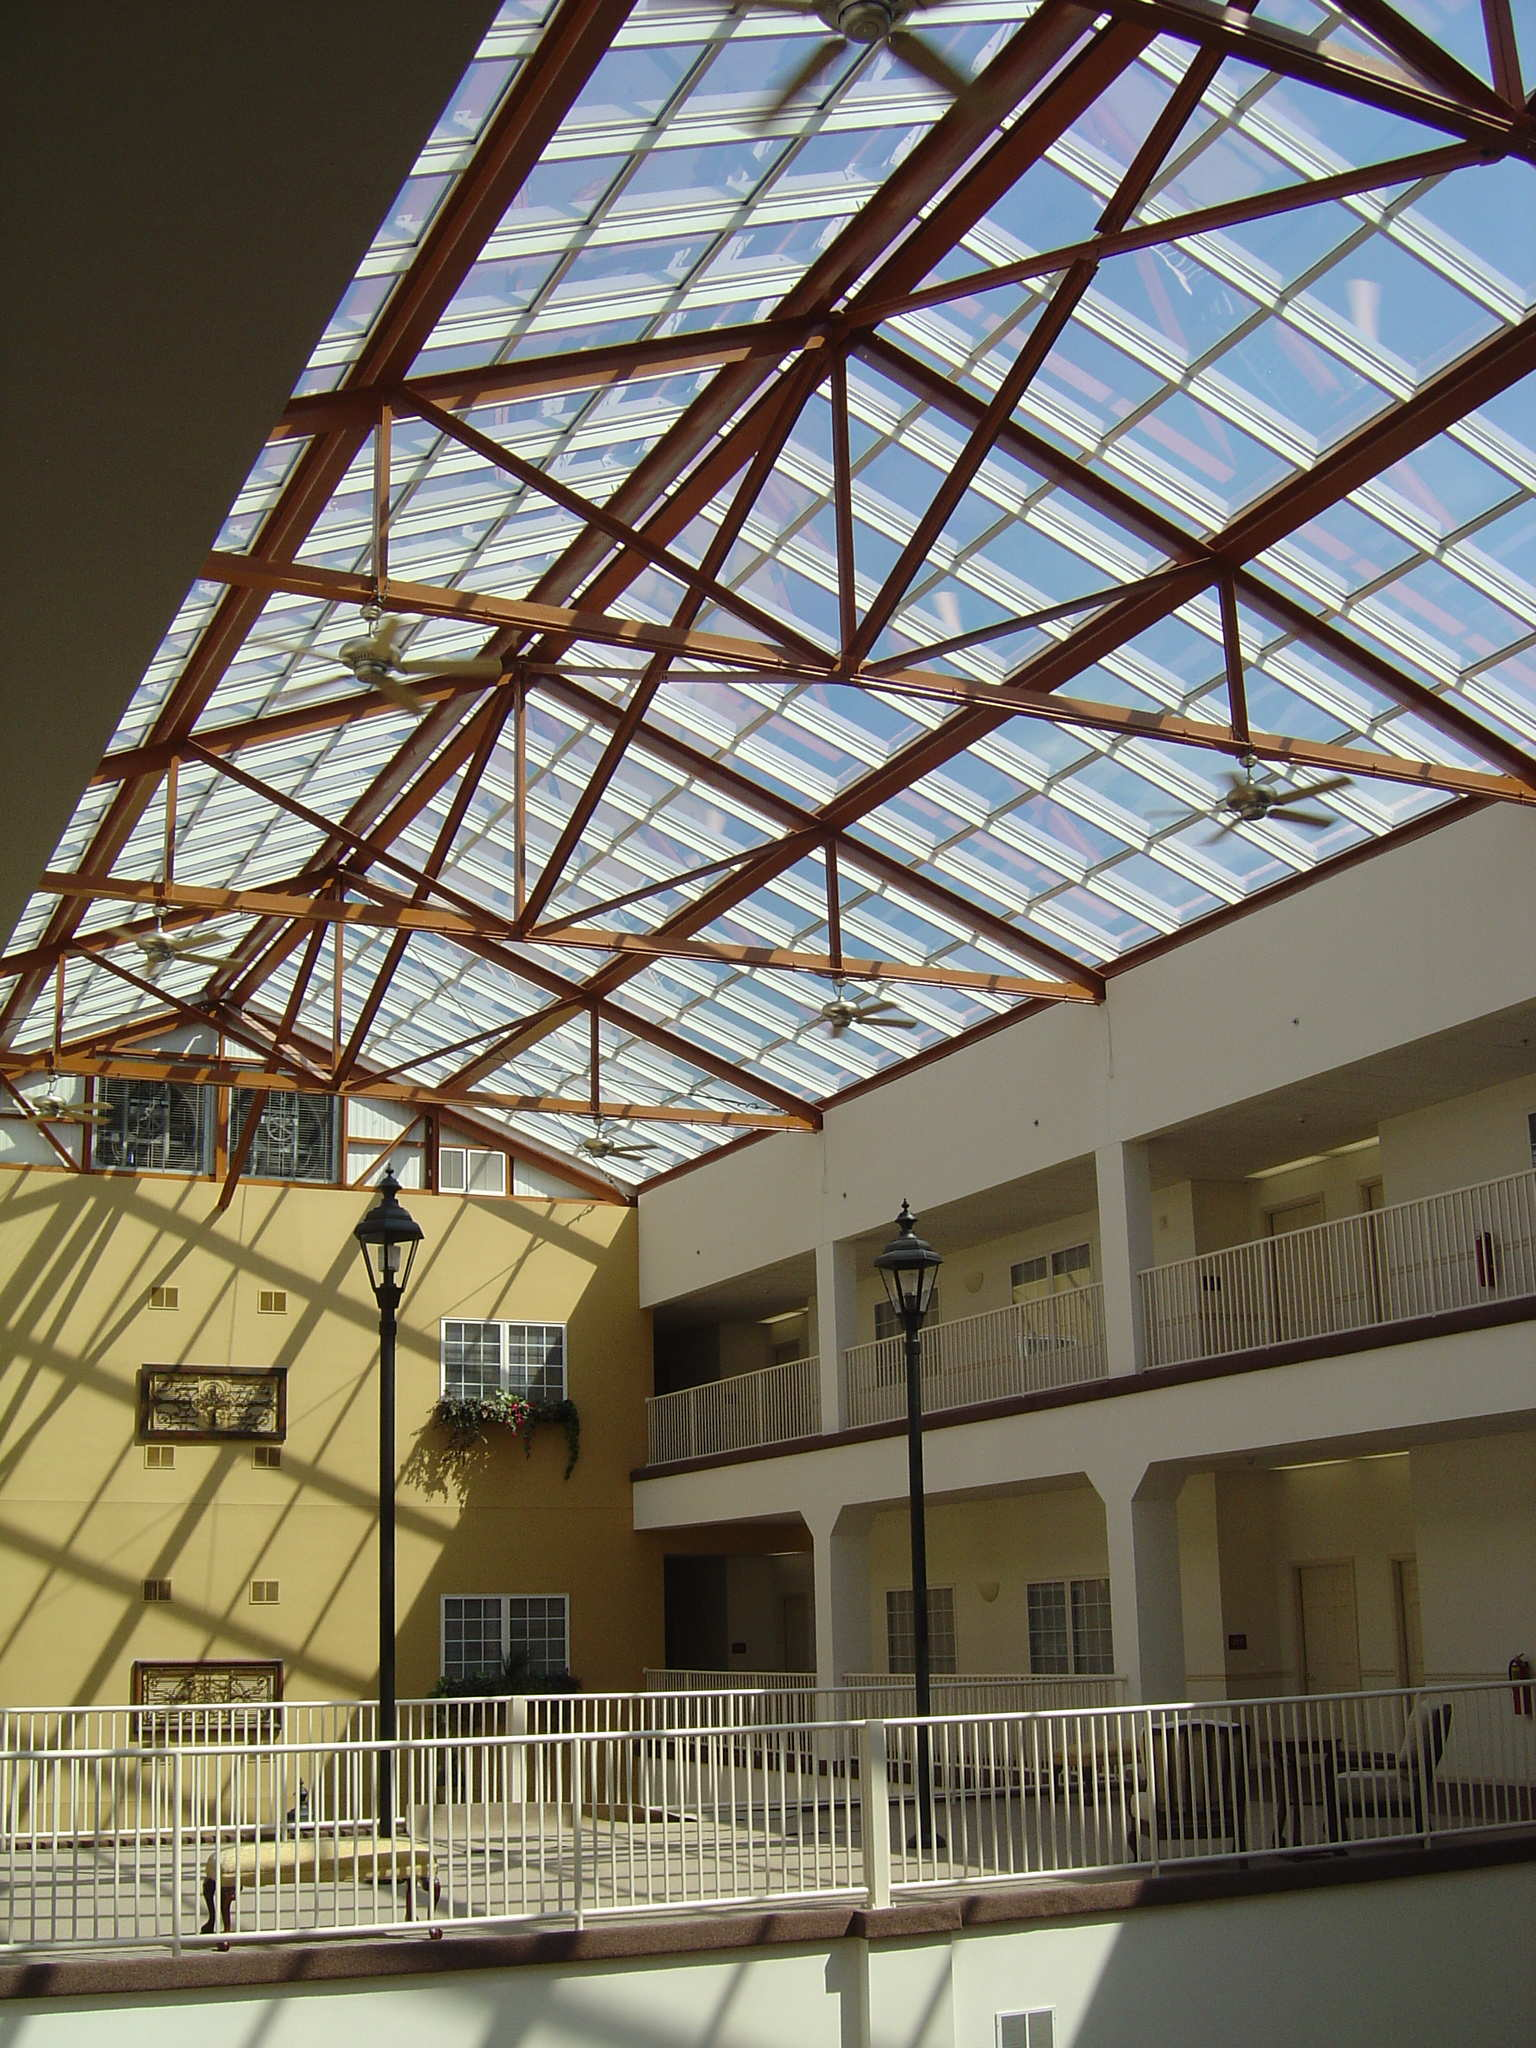 Botanical greenhouse builders llc westlake ohio oh for Greenhouse skylights